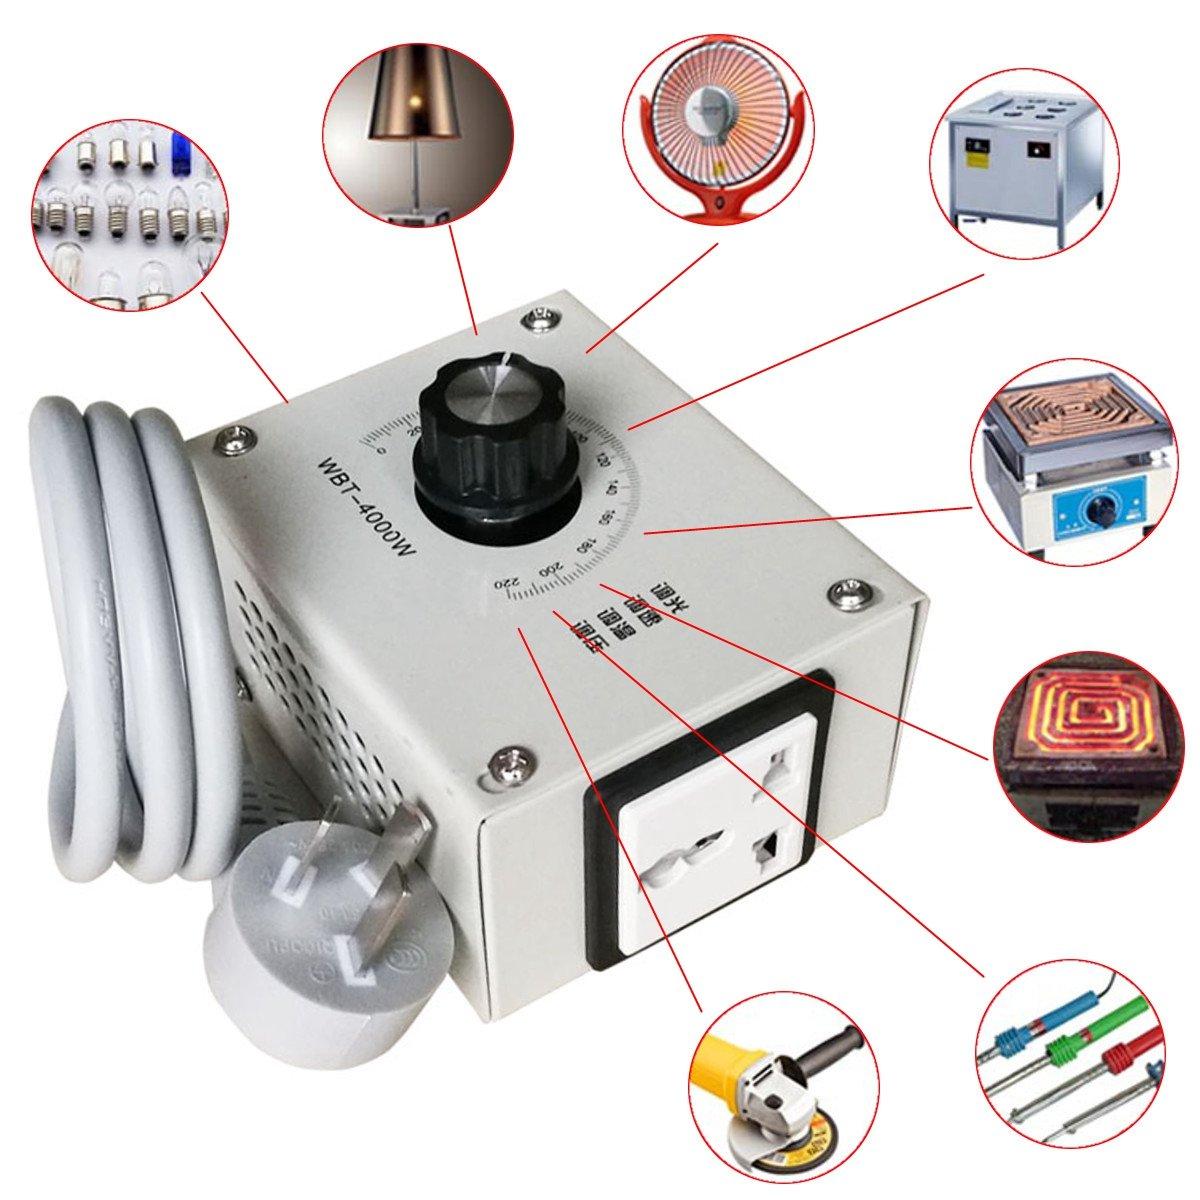 MASUNN 4000W Ac 220V Variabler Spannungsregler Fü r Lü fter Drehzahl Motor Temperatur Dimmer